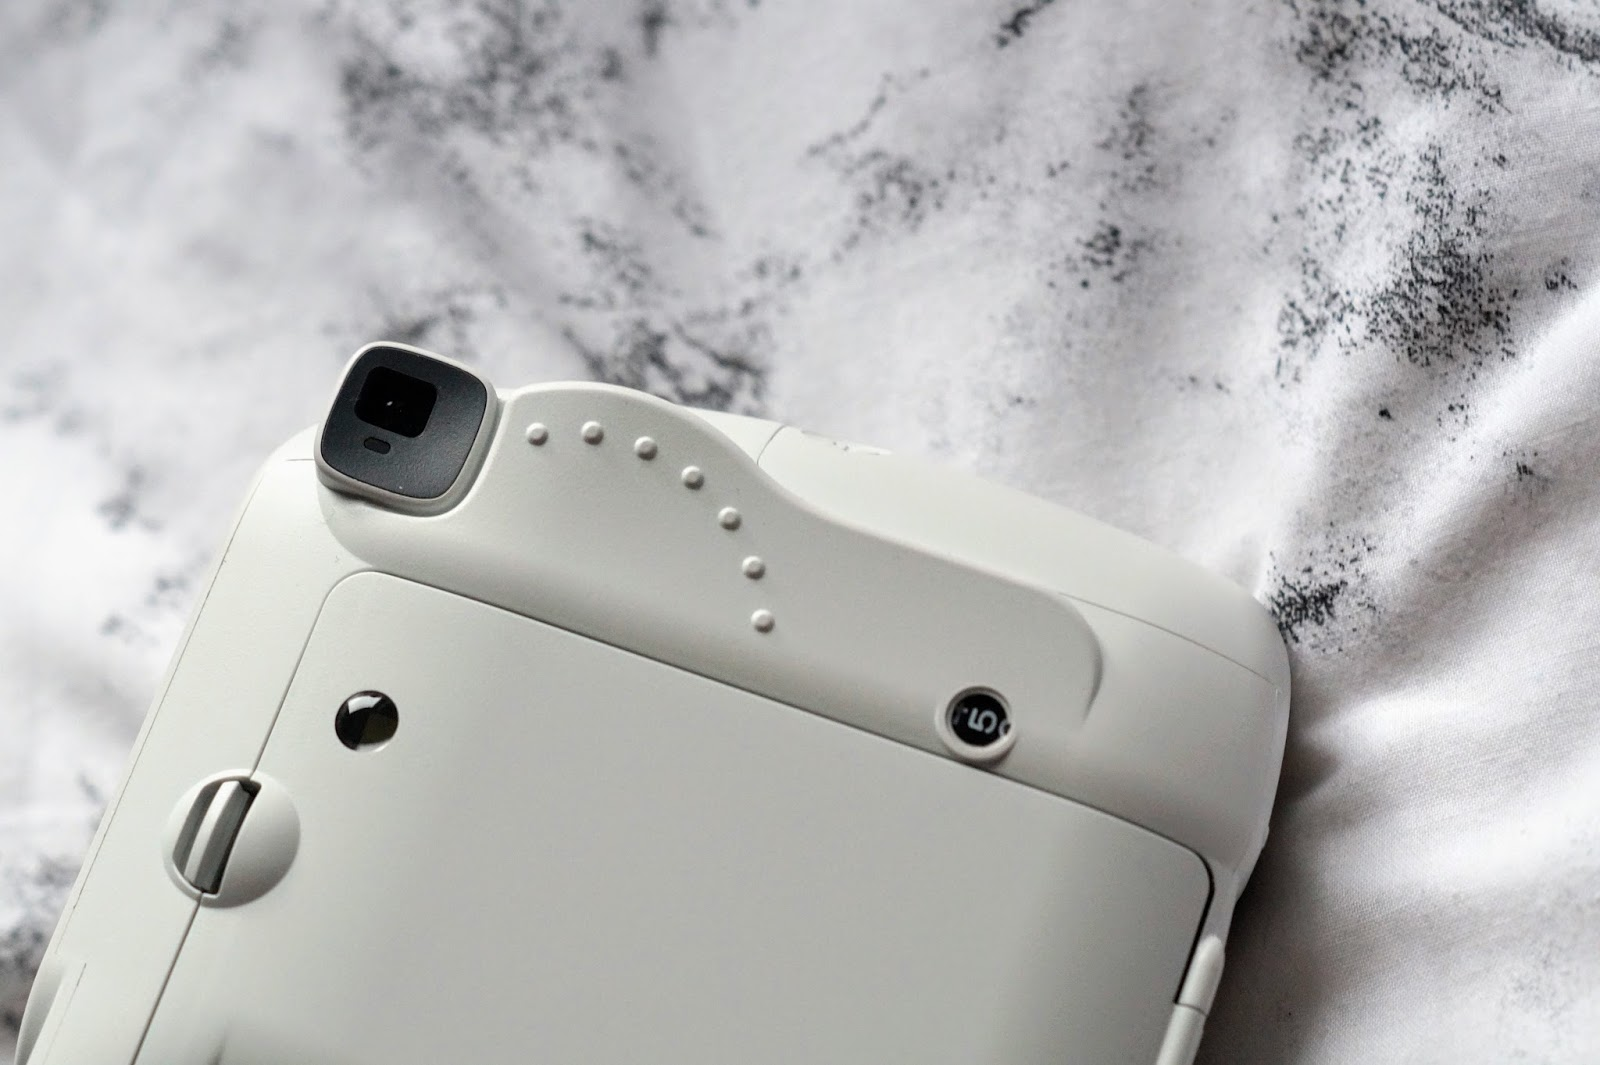 instax mini 9 viewfinder